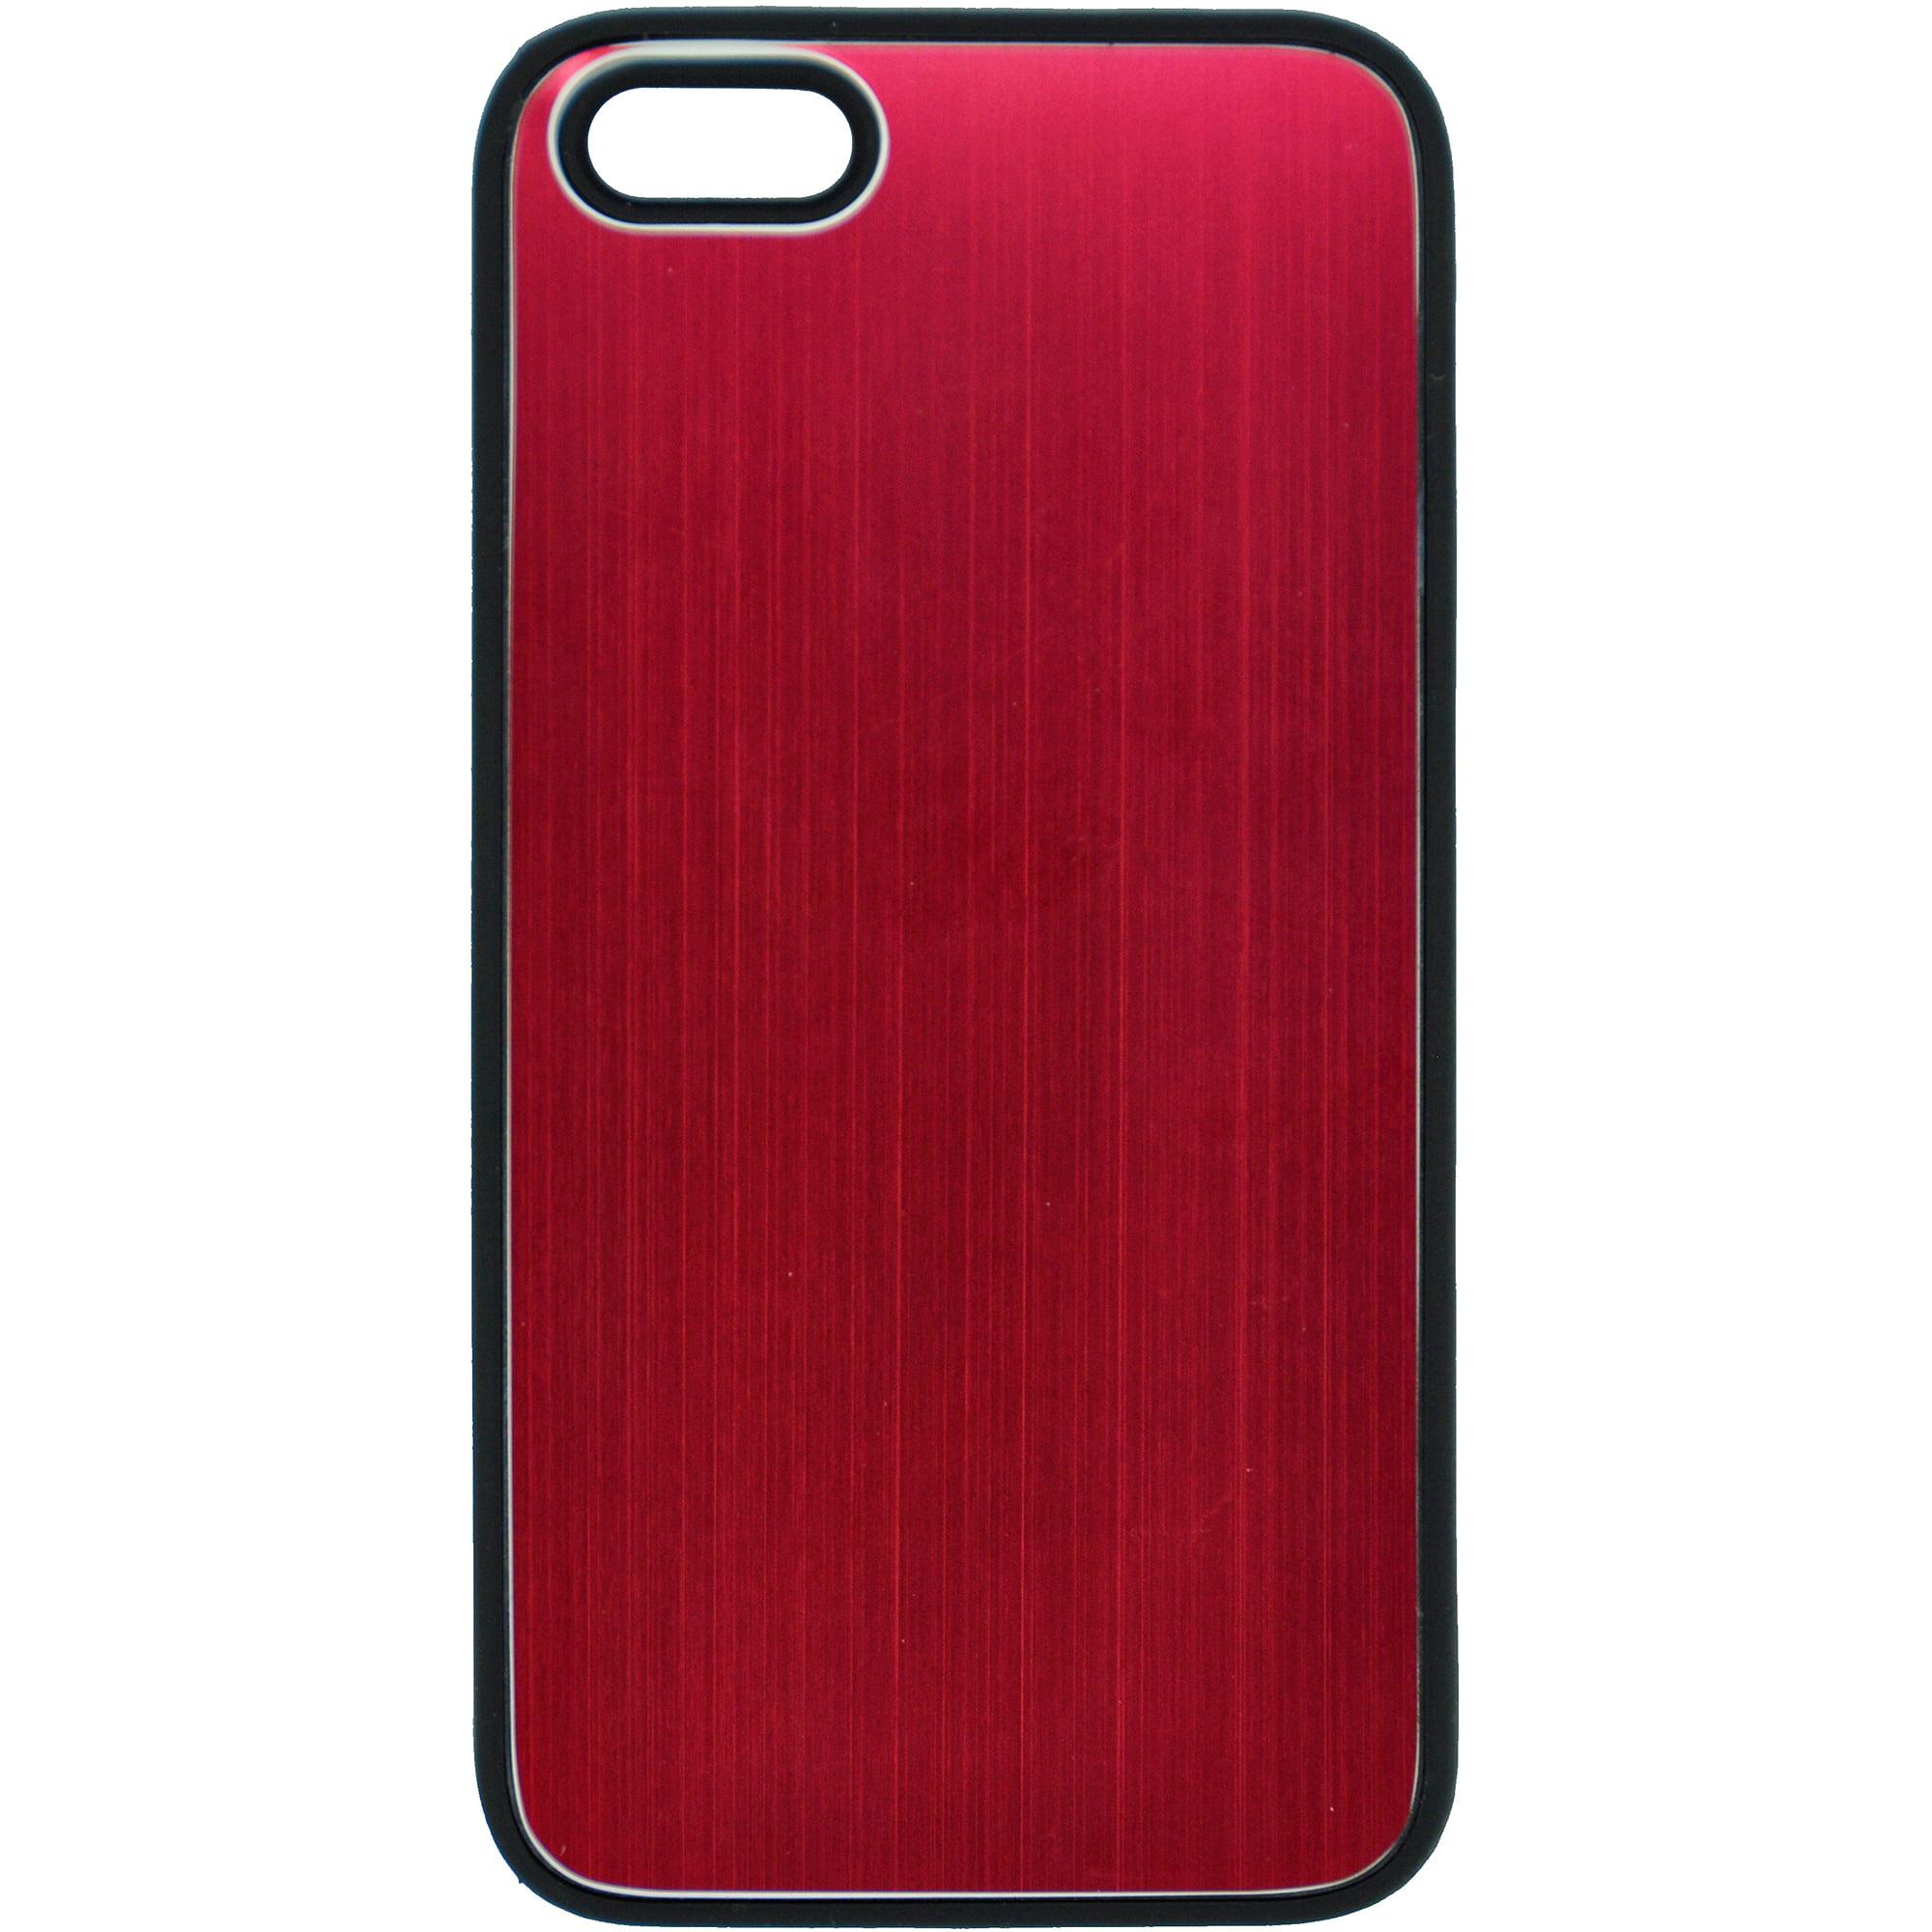 iPhone 4/4S TPU Case, Gunmetal/Red